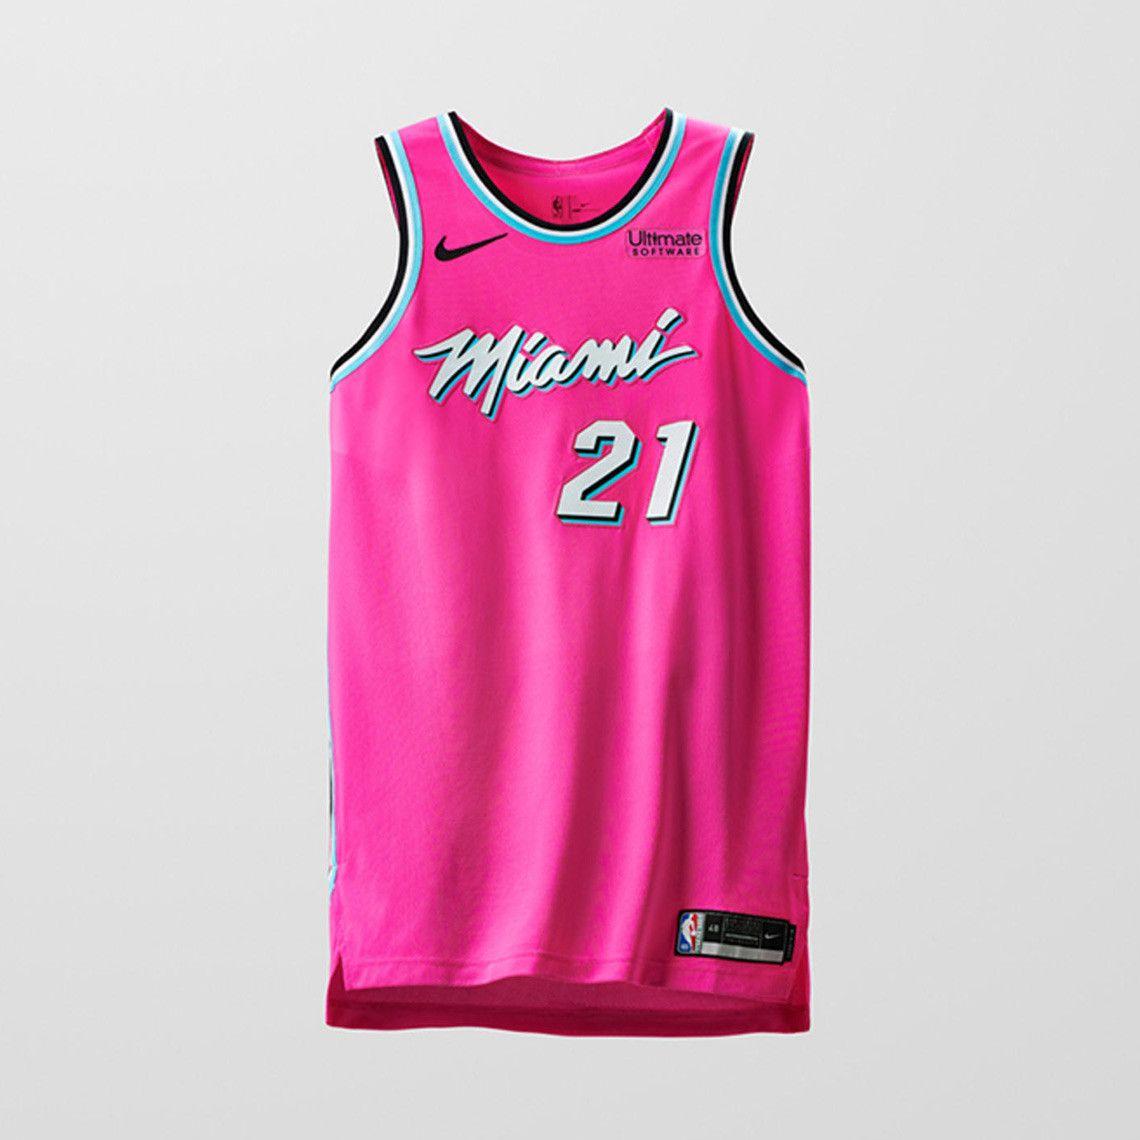 Nike Nba Earned Edition Jersey Sneakernews Com Basketball Uniforms Design Nba Fashion Nba Clothing